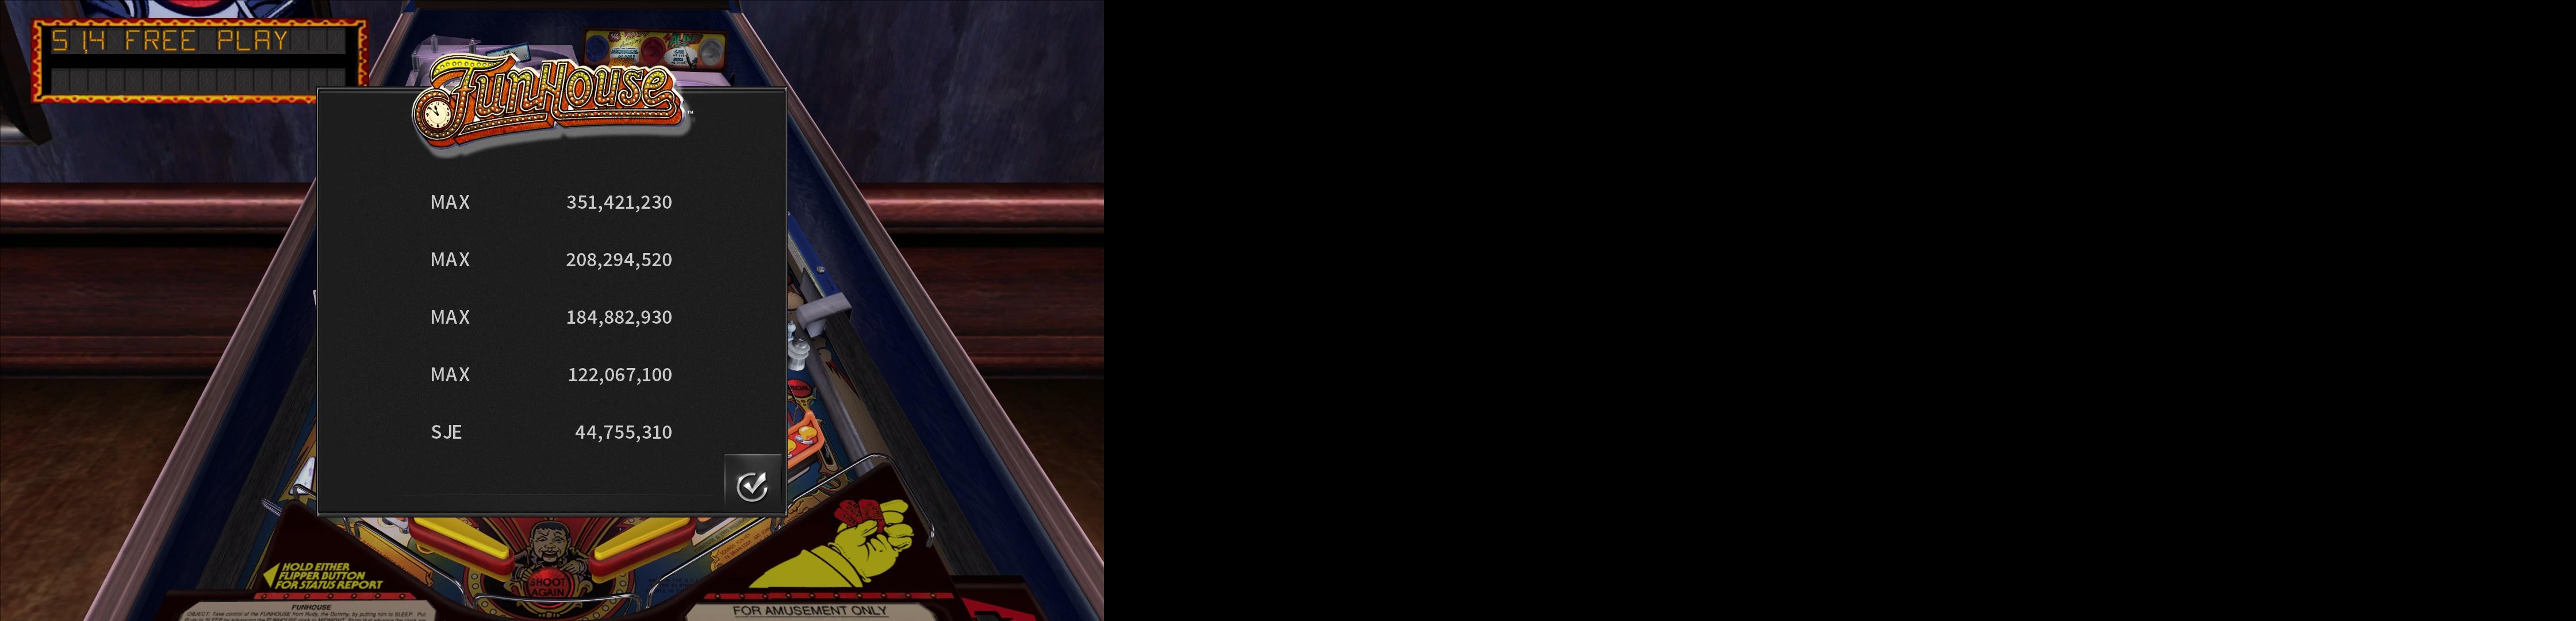 Maxwel: Pinball Arcade: Funhouse (PC) 351,421,230 points on 2017-01-06 13:55:49